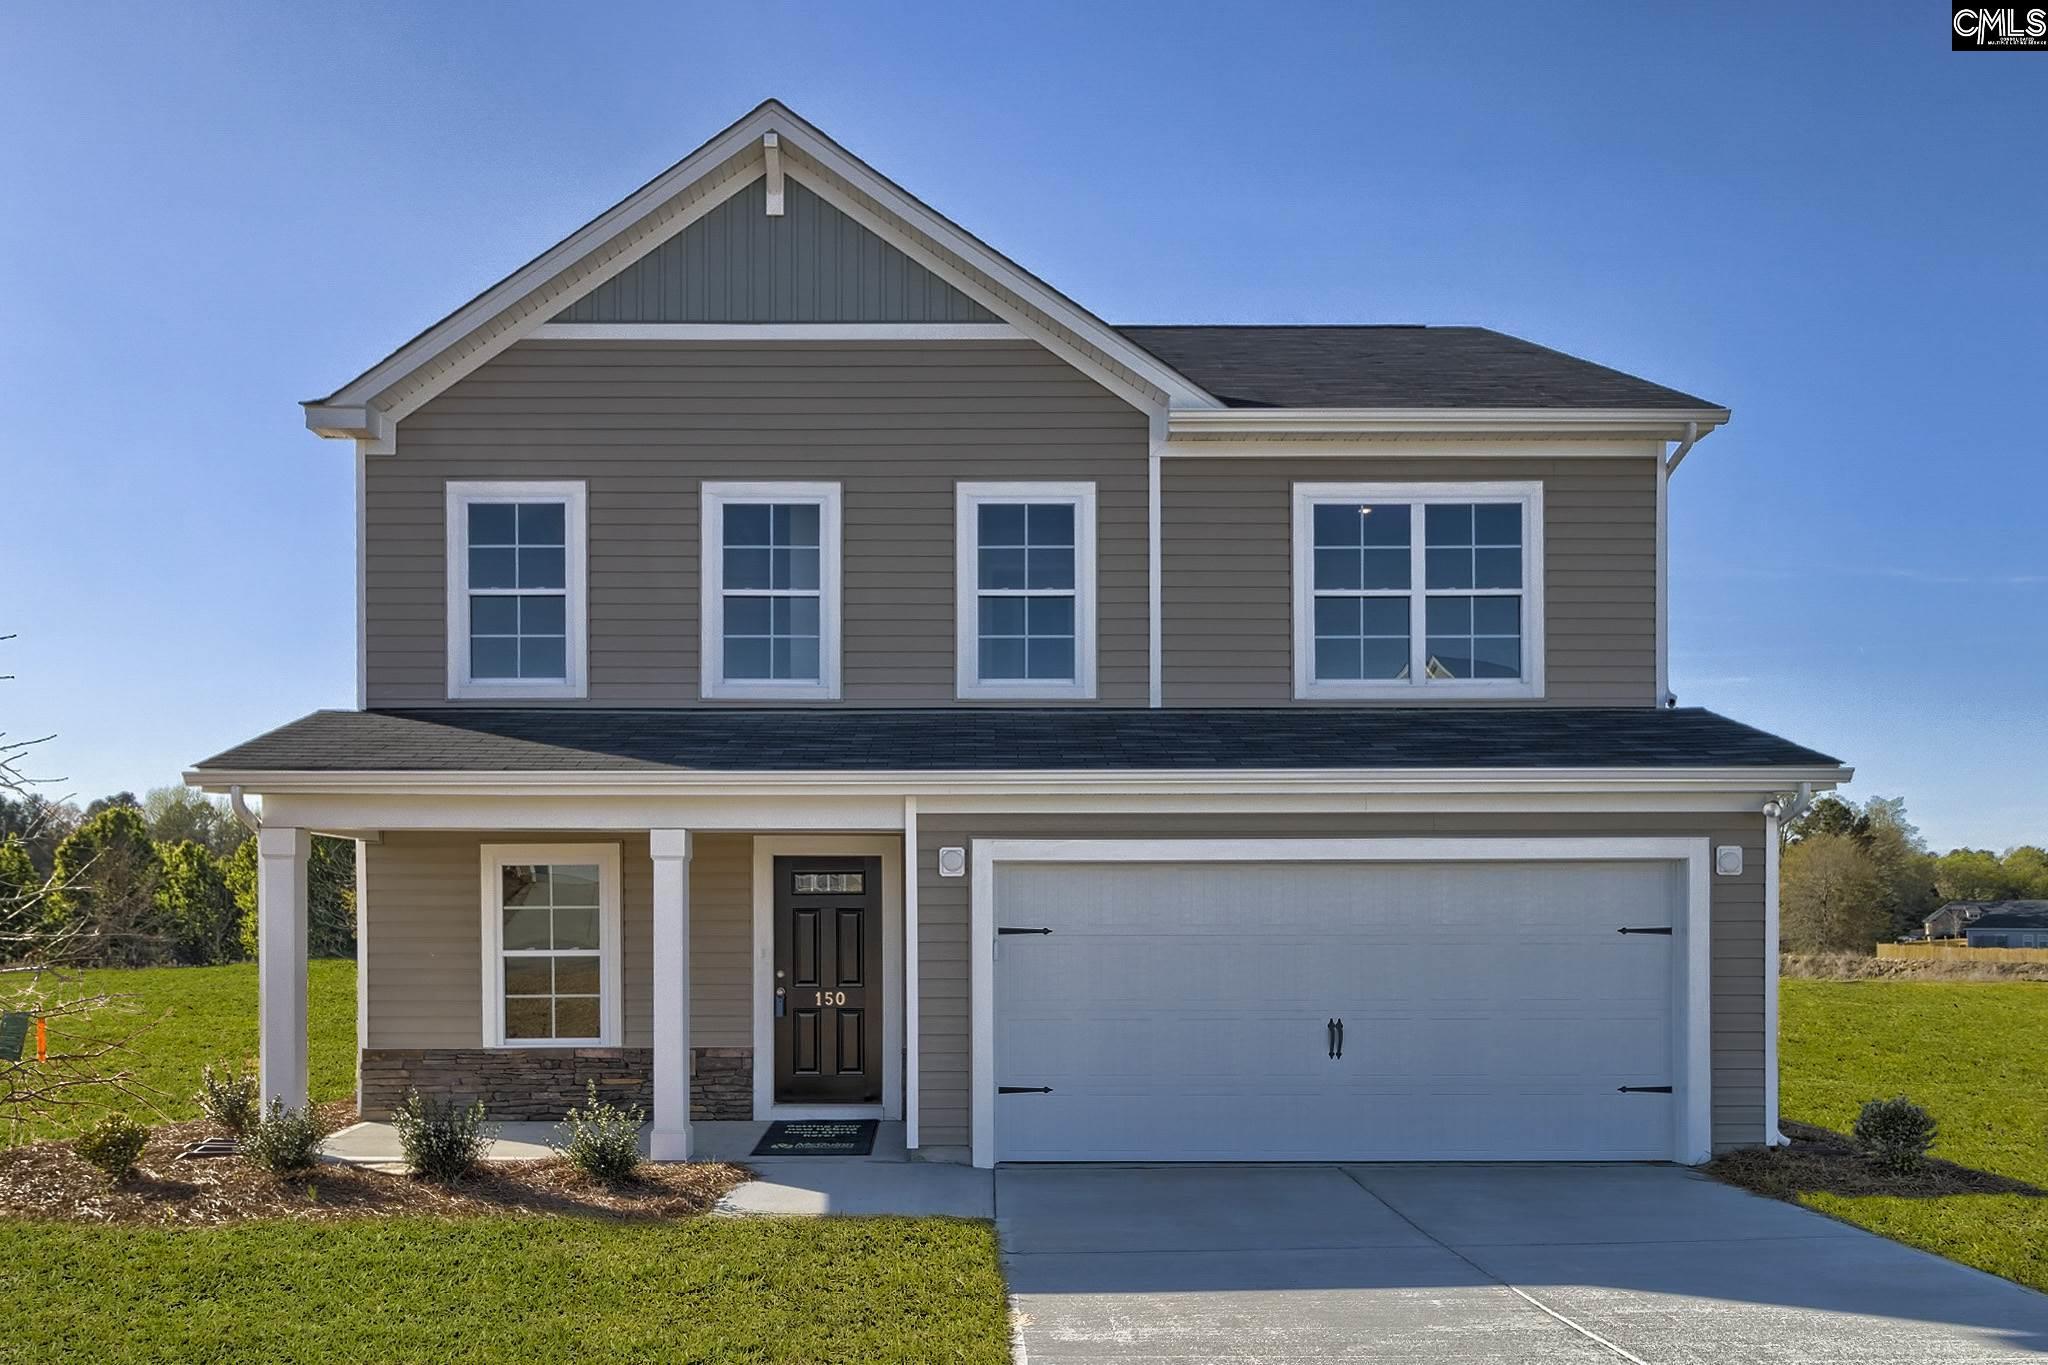 347 Bush Clover Leesville, SC 29070